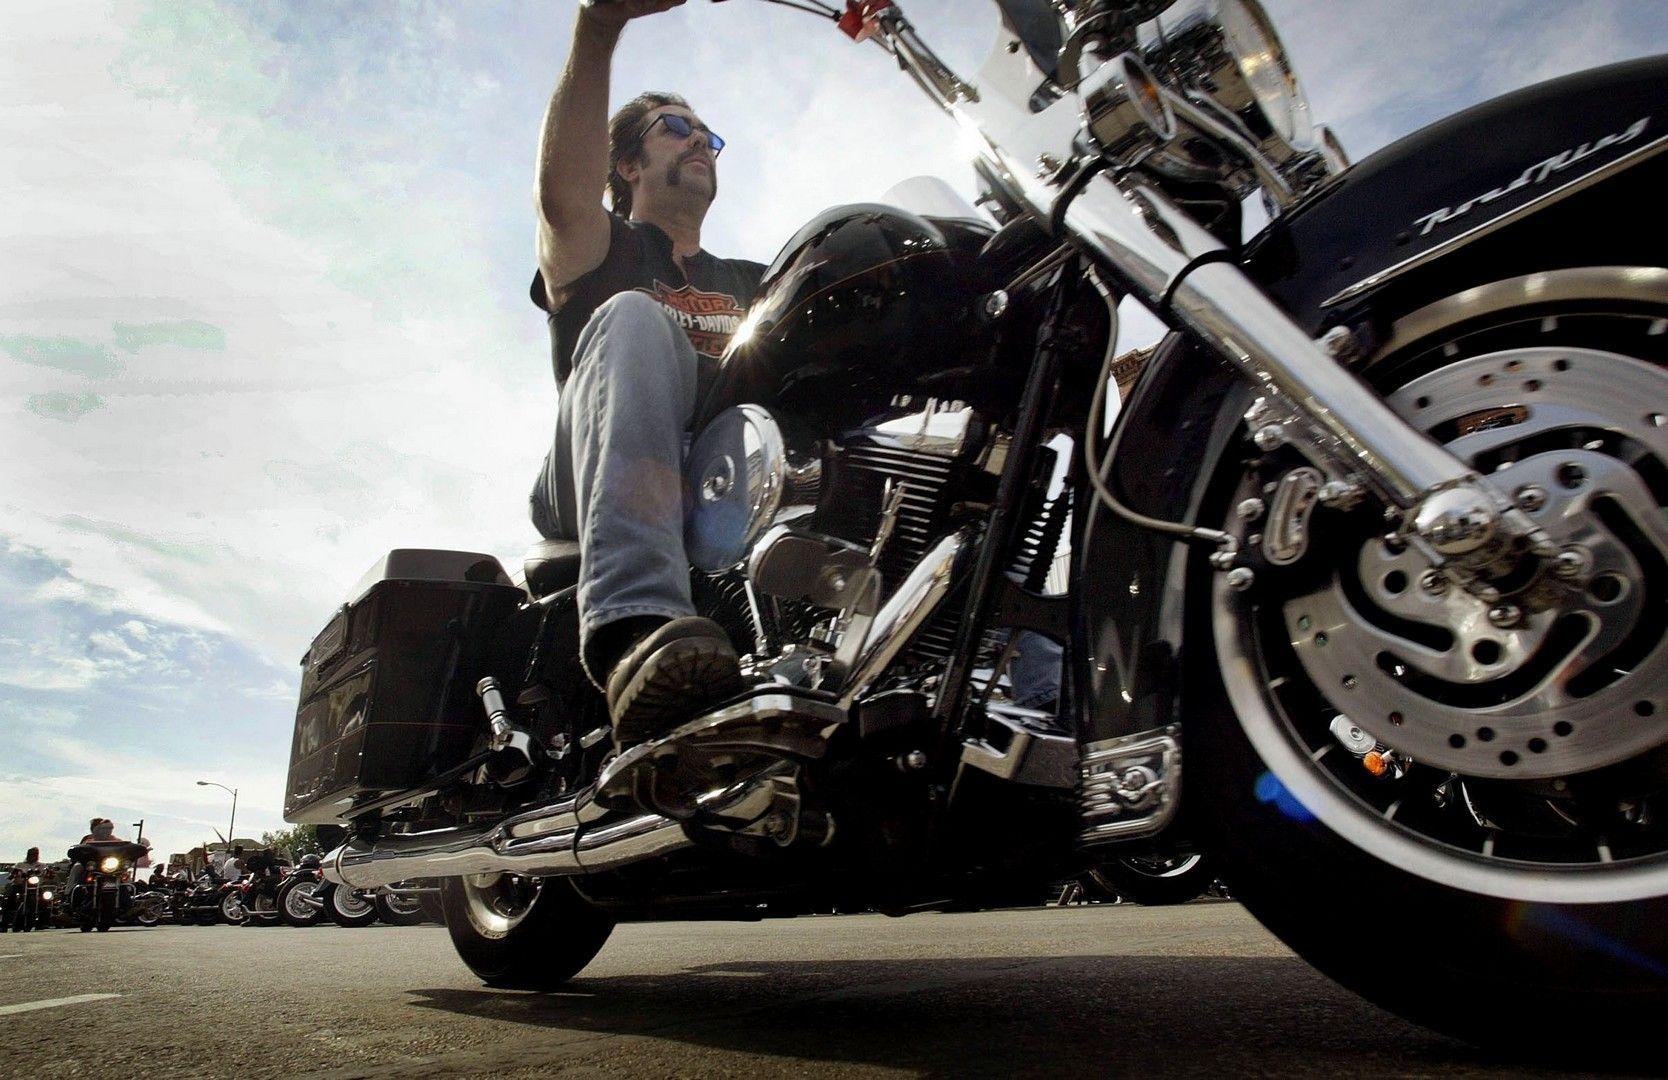 bikers wallpaper | subcultures wallpaper | pinterest | bikers and